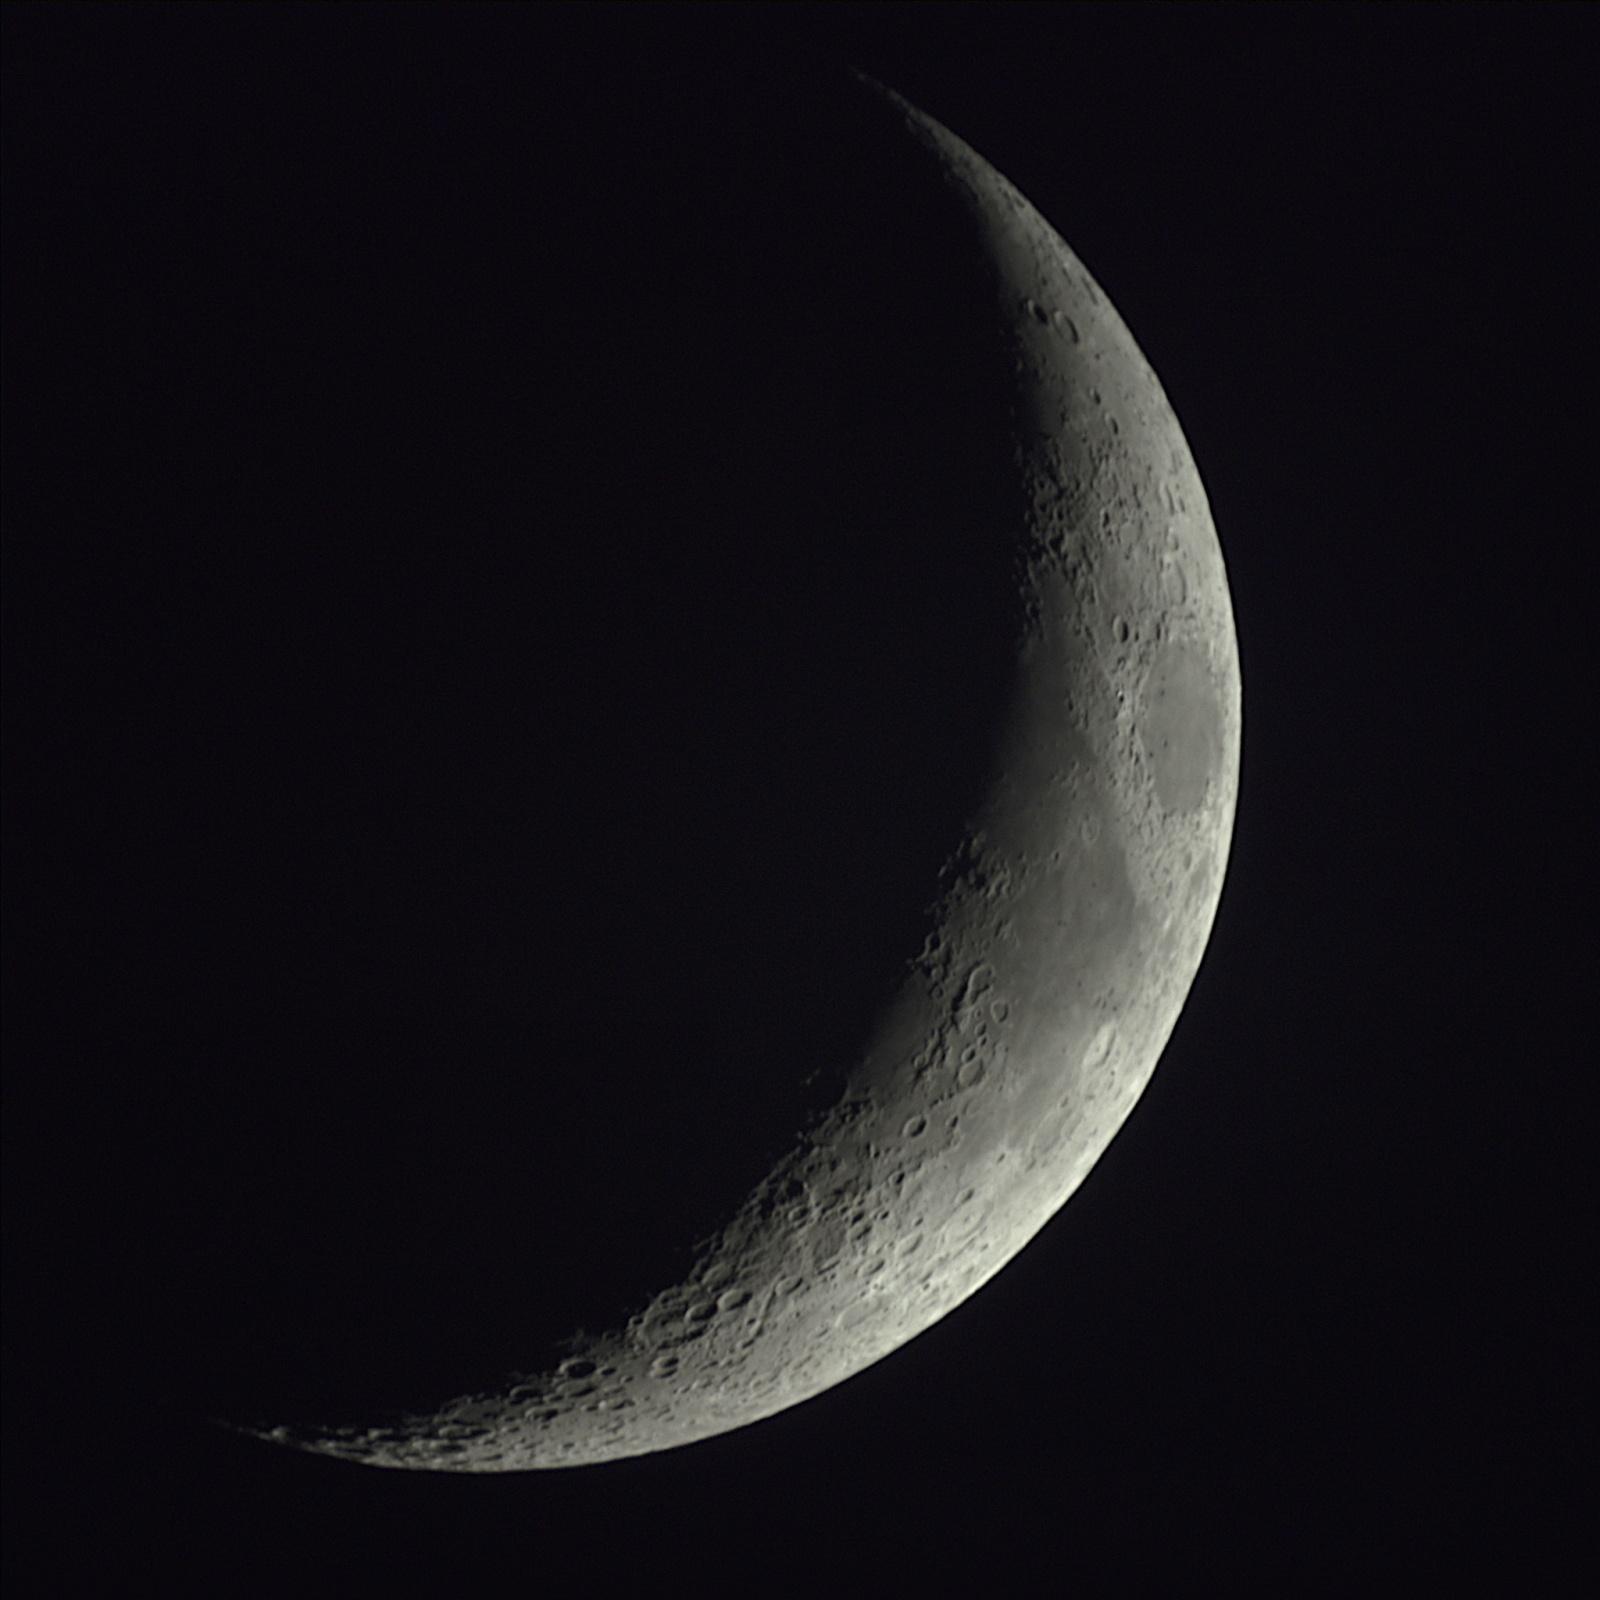 Moon_20210614_r.thumb.jpg.747f619a99dbbf008d8a6e54ef756875.jpg